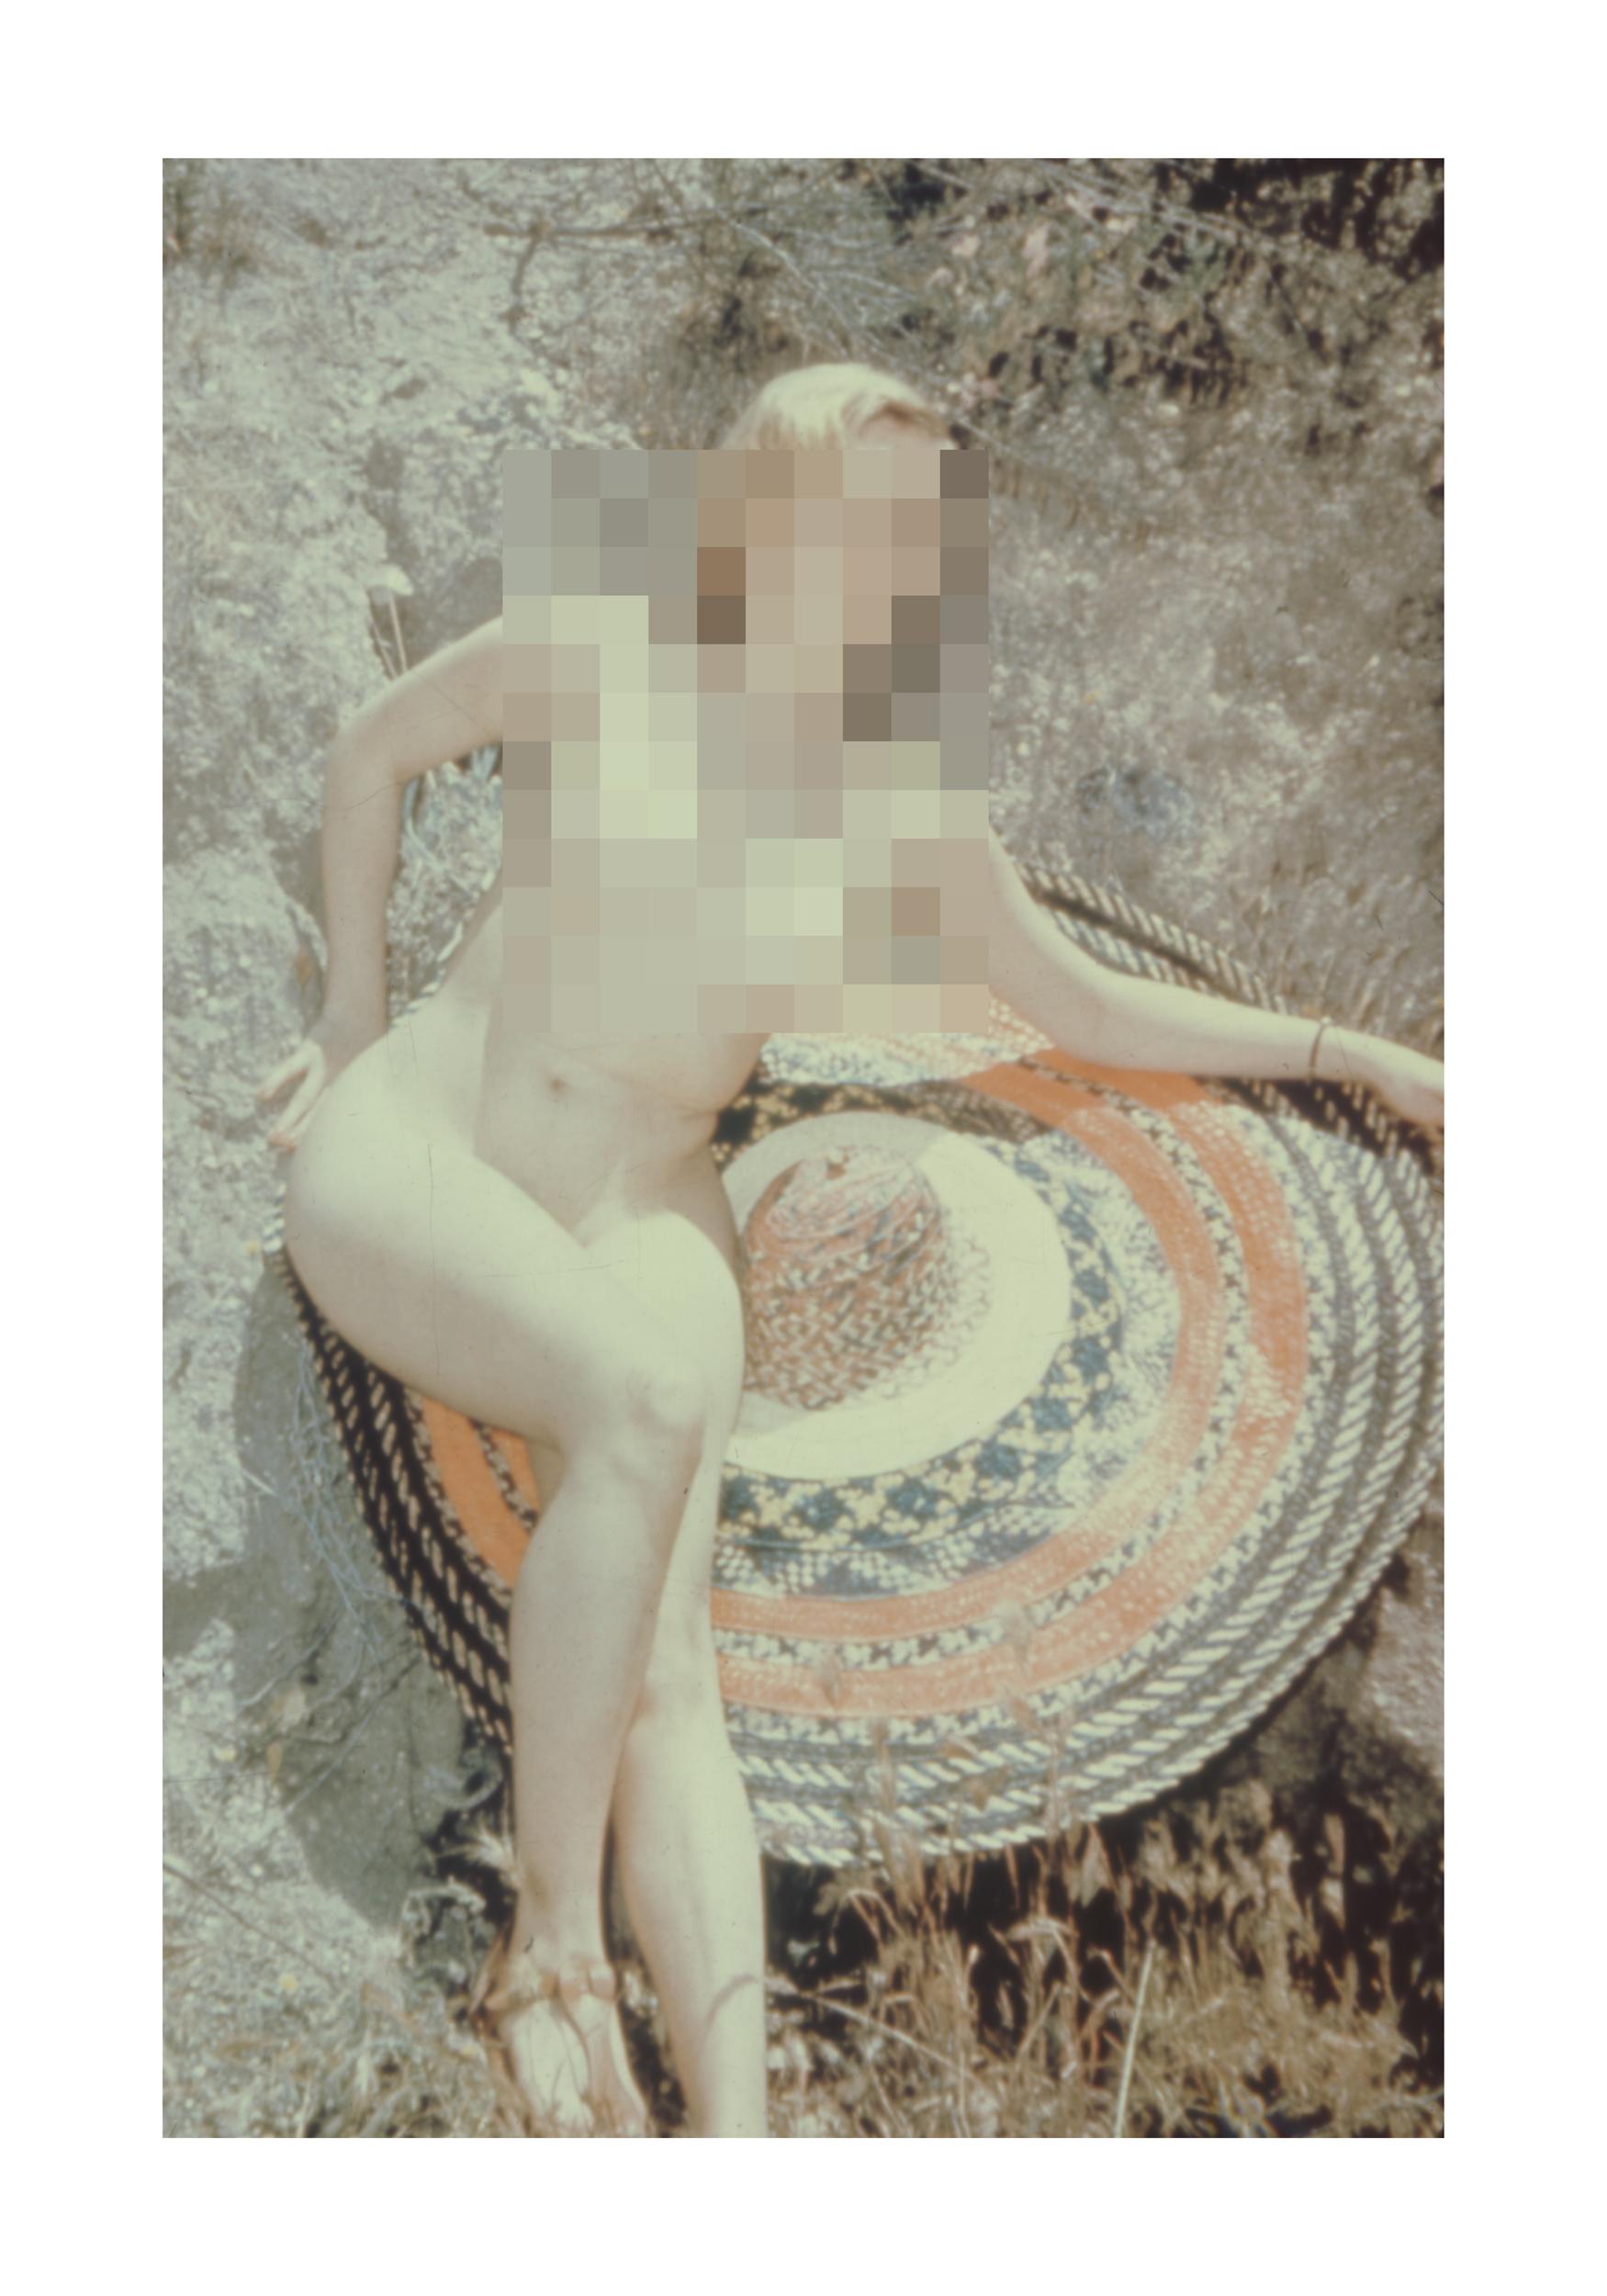 Untitled (n033), 2014